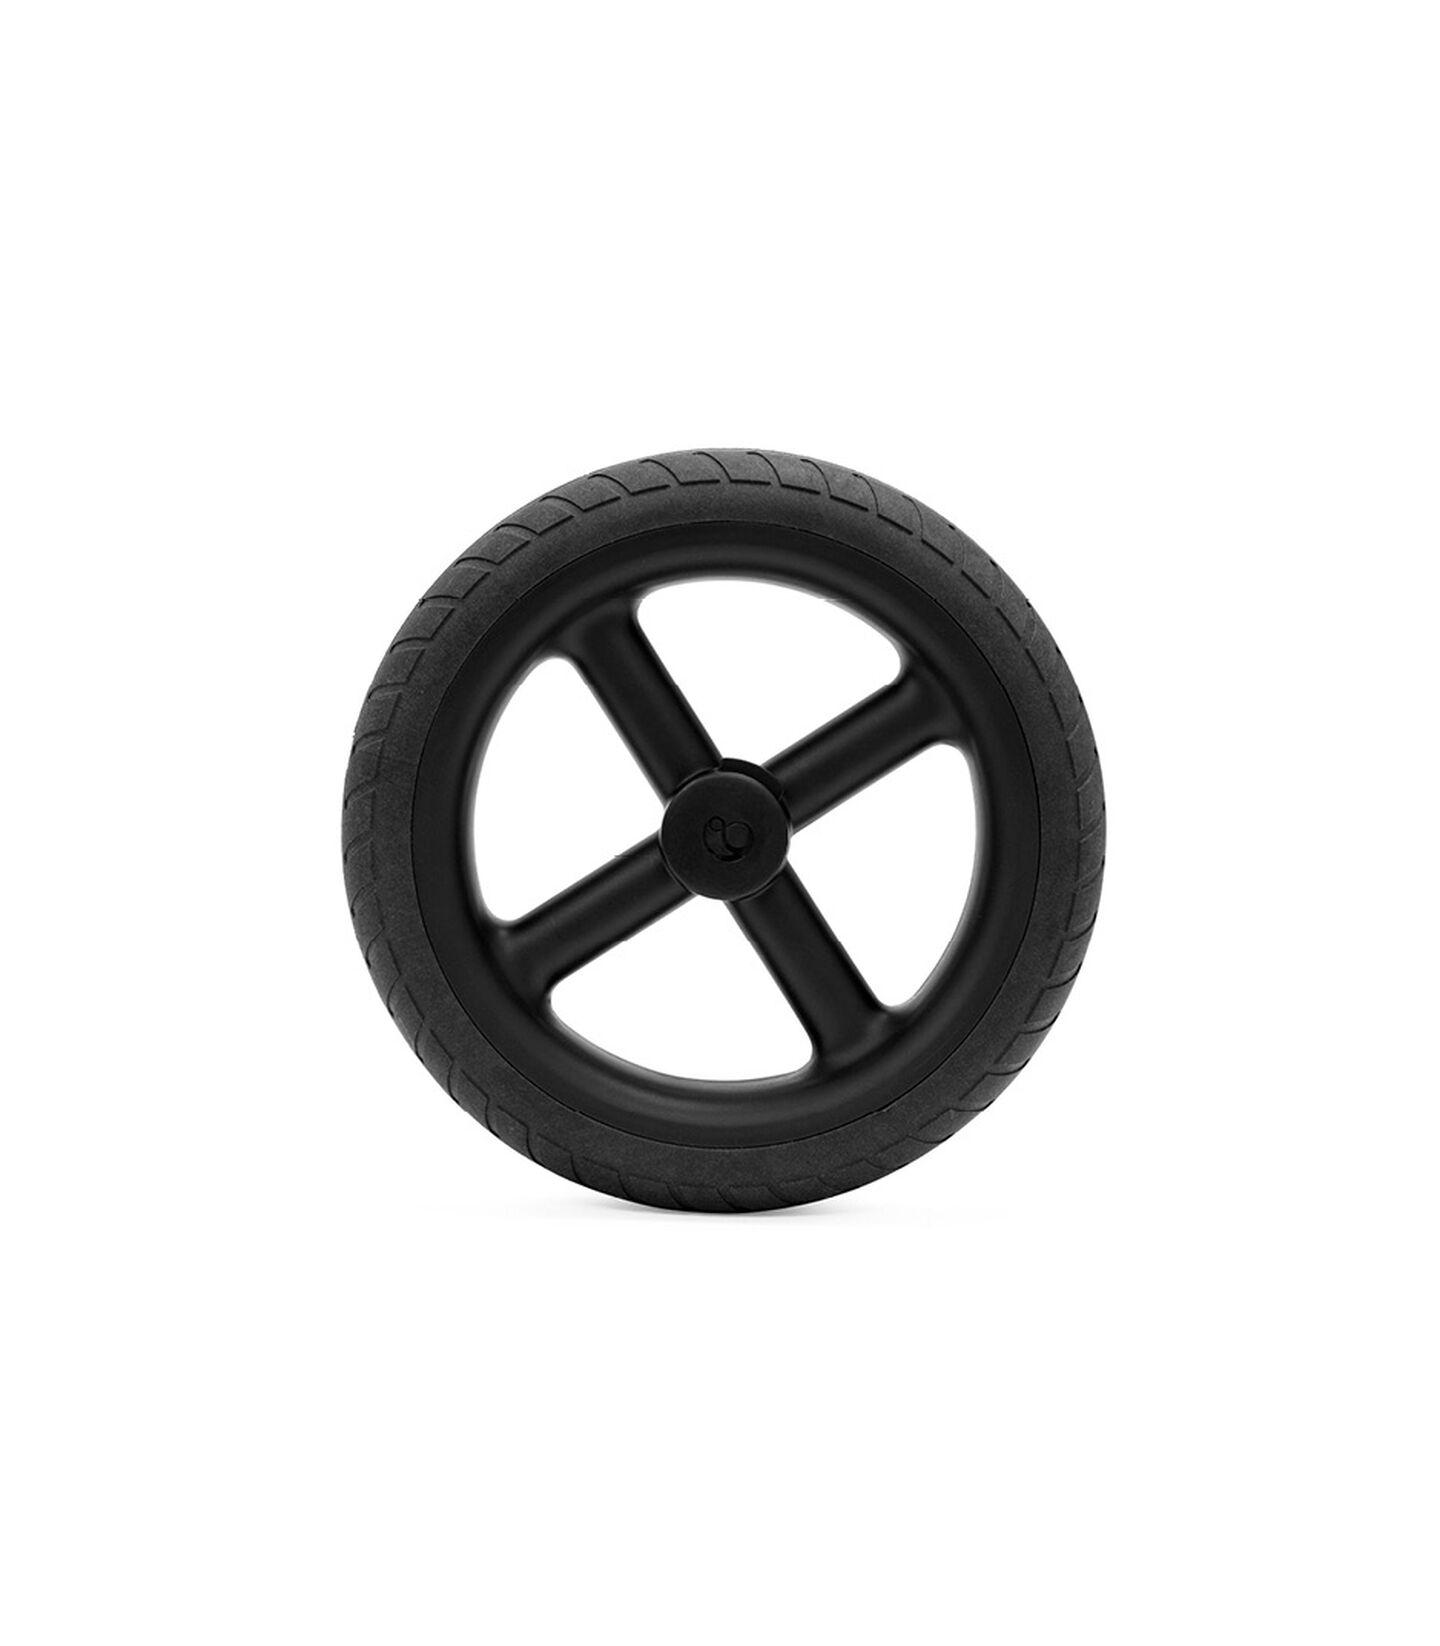 Stokke® Beat back wheel (single packed), , mainview